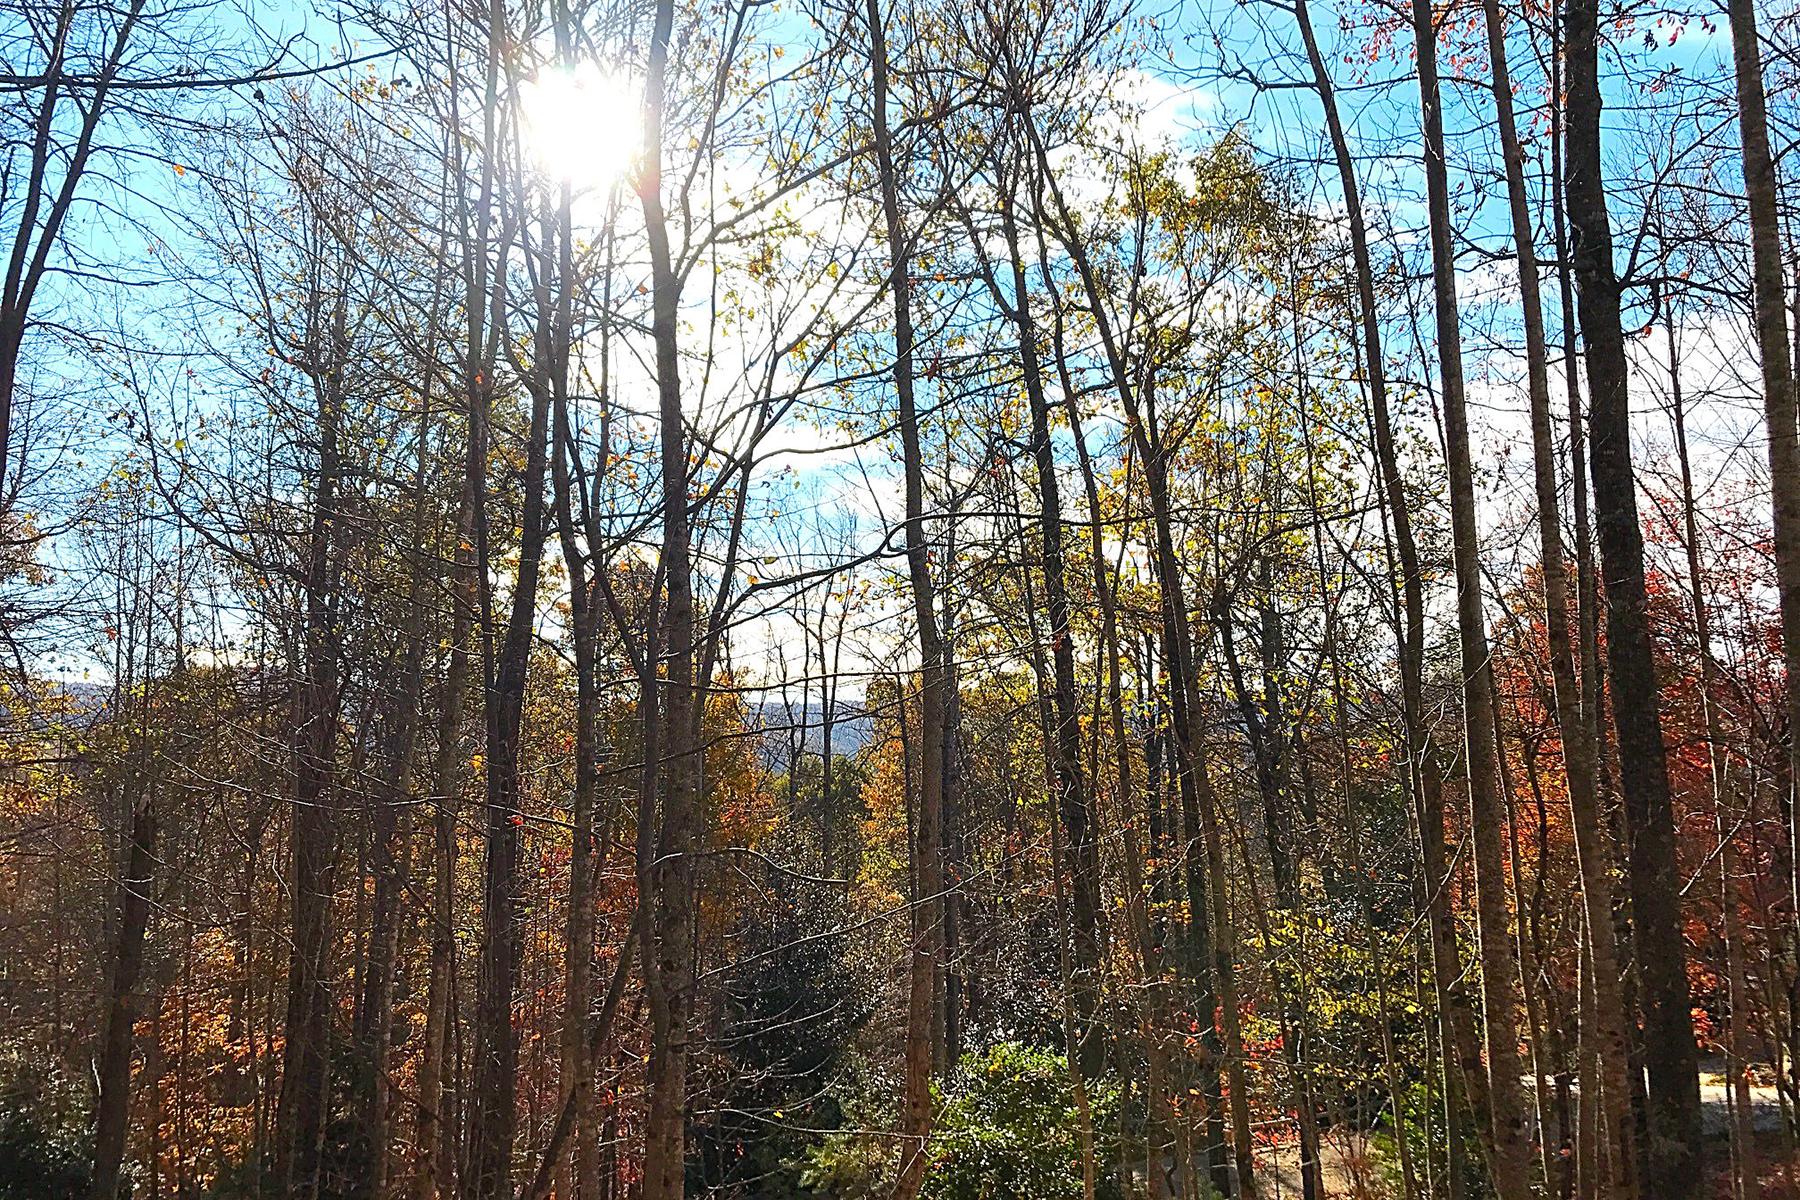 Terreno para Venda às OLETA FALLS 527 Overlook Park Dr 78 Phase II Hendersonville, Carolina Do Norte, 28792 Estados Unidos